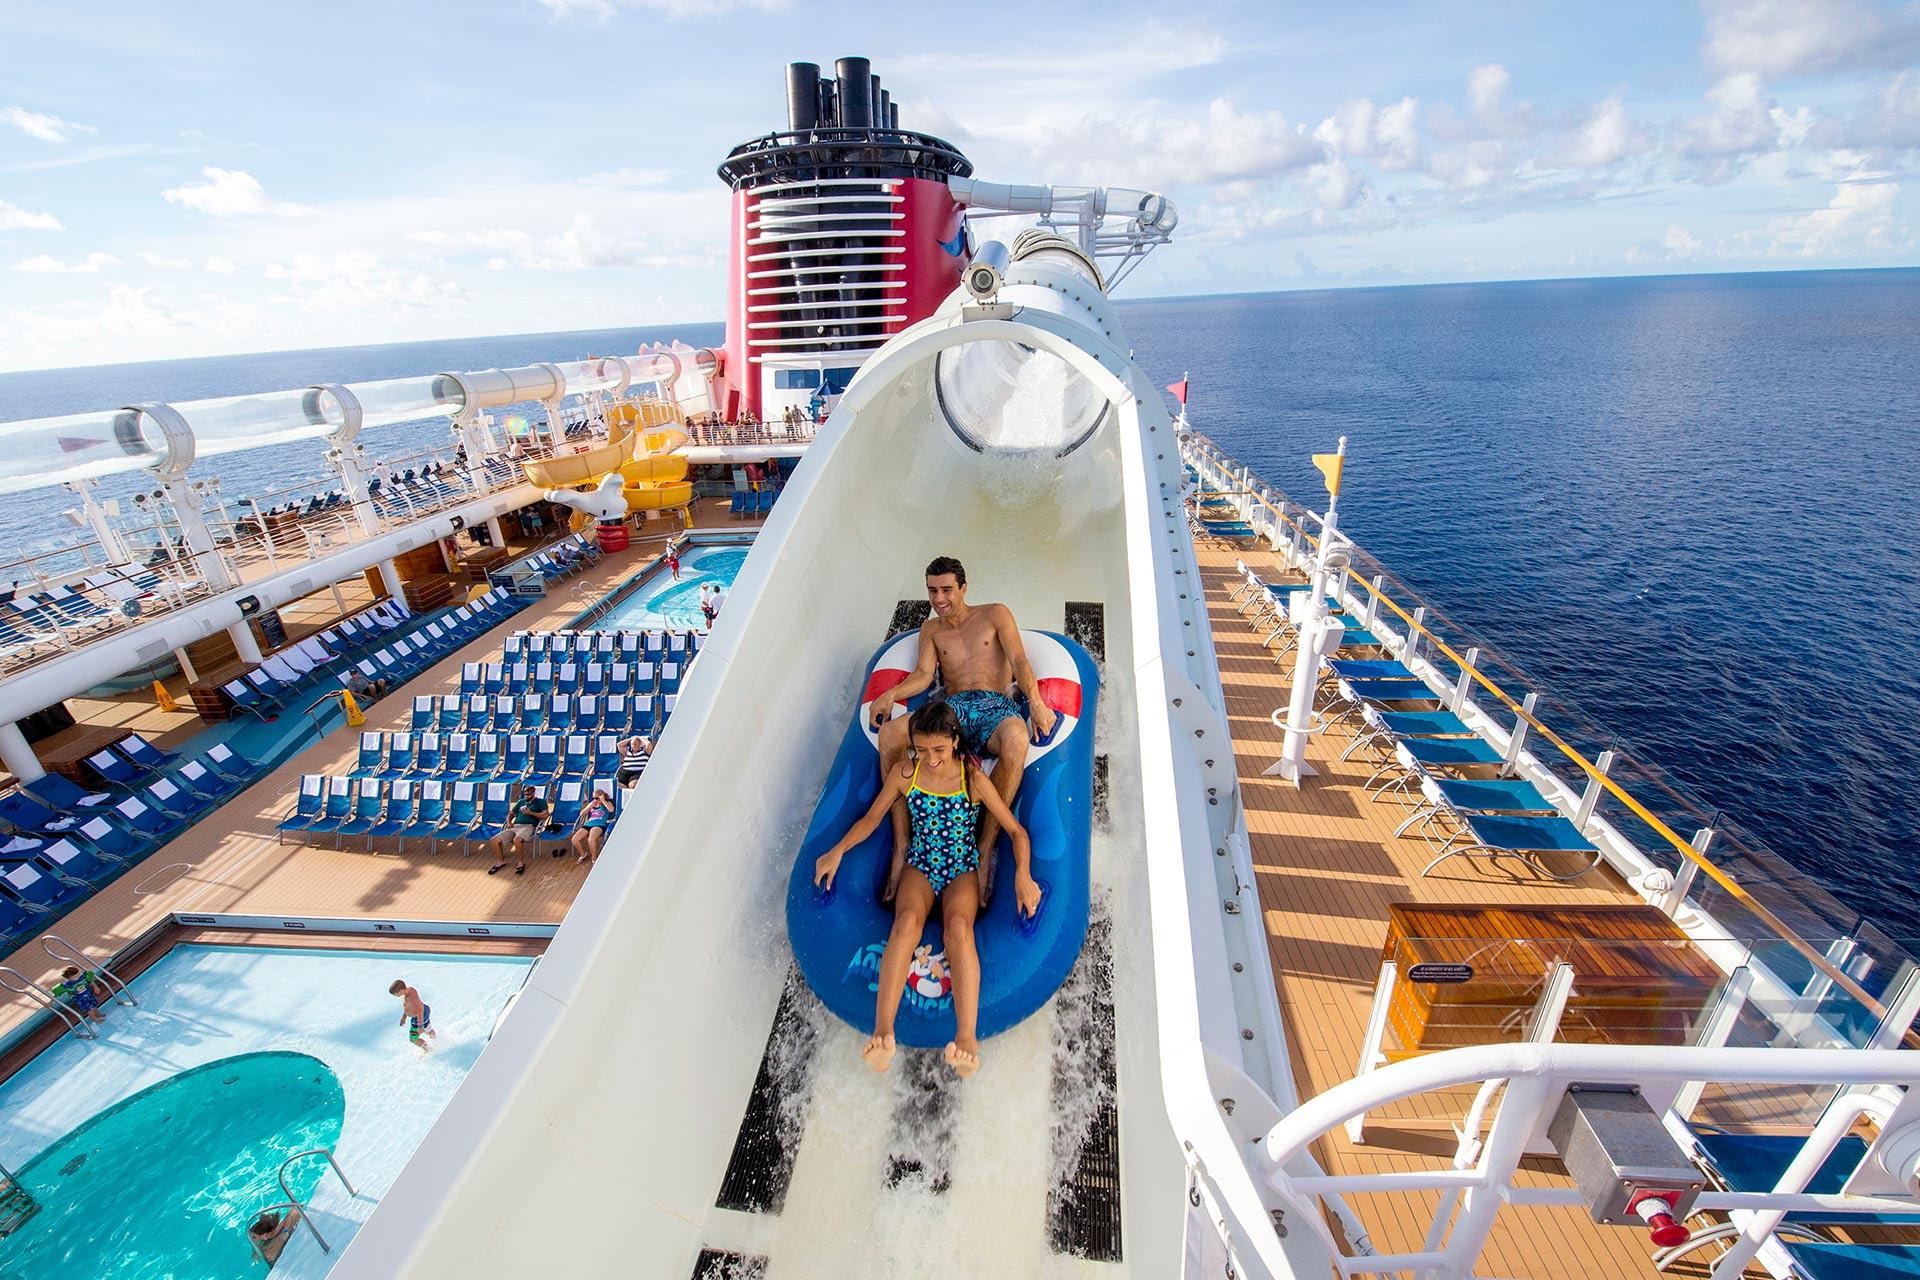 AquaDuck on Disney Cruise Line